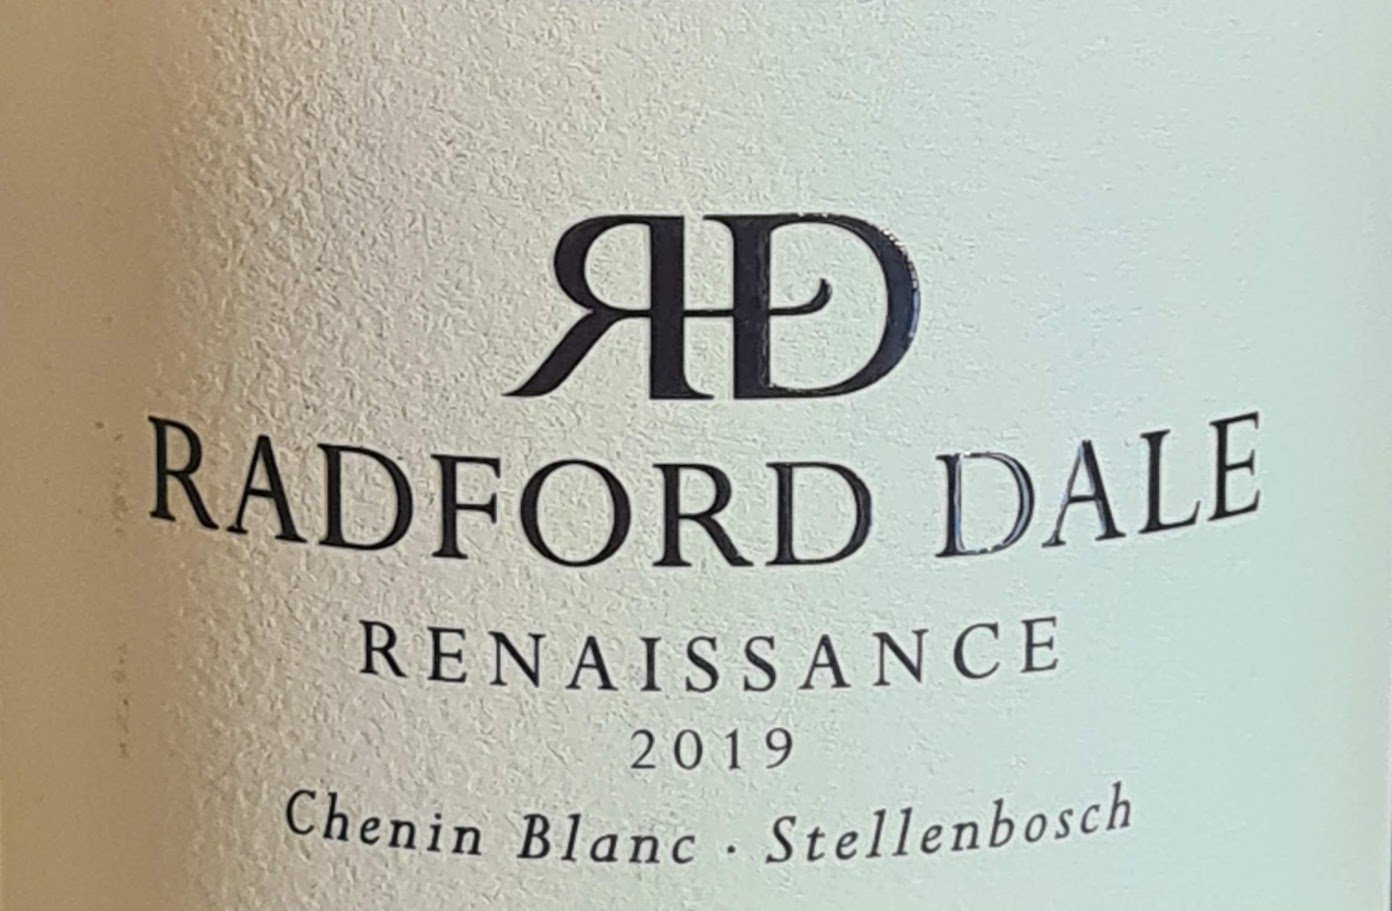 Radford Dale Renaissance Chenin Blanc 2019 photo